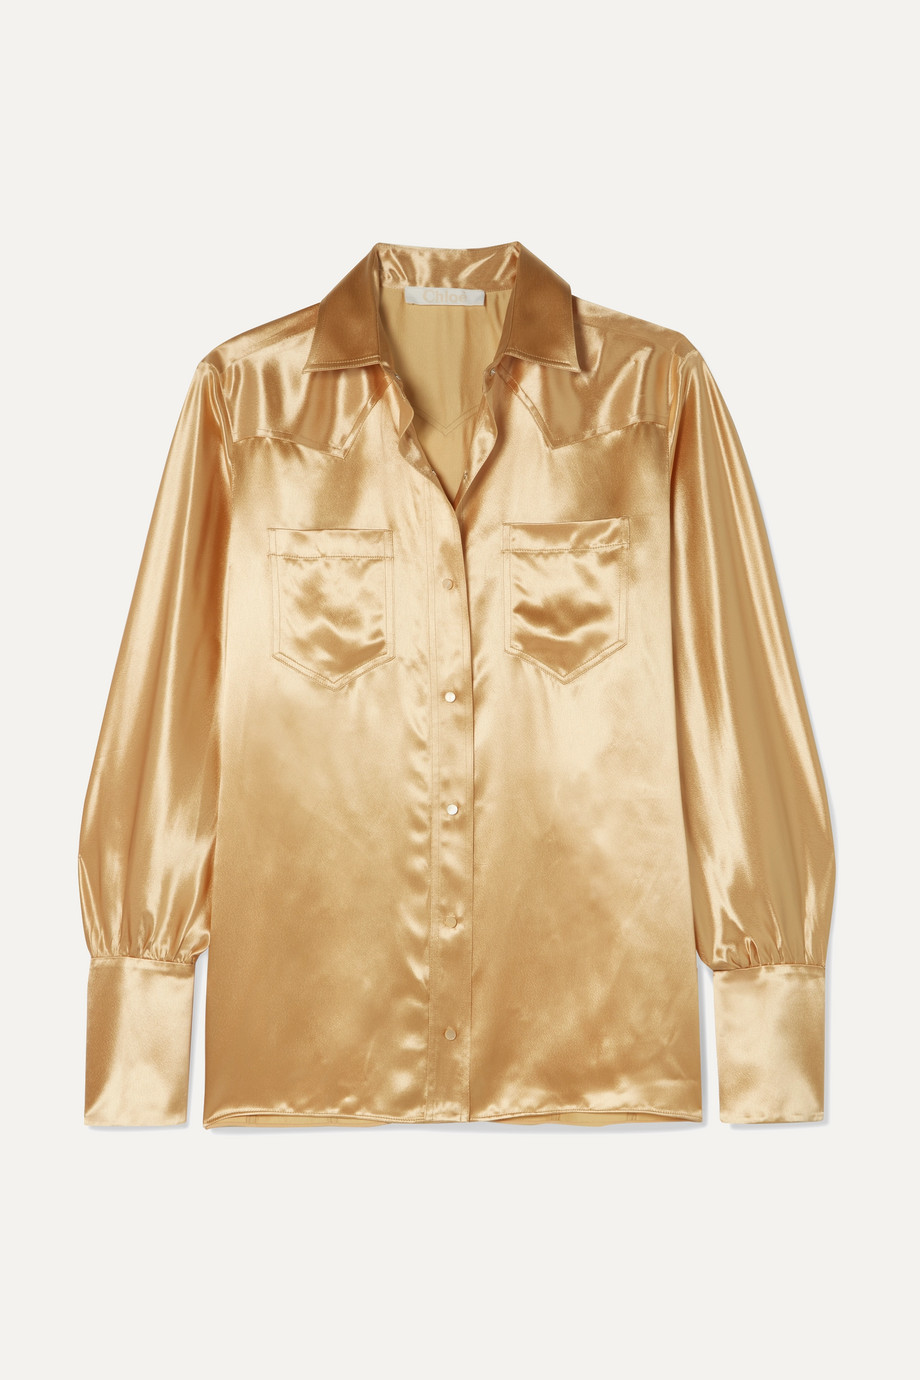 Chloé Metallic satin blouse